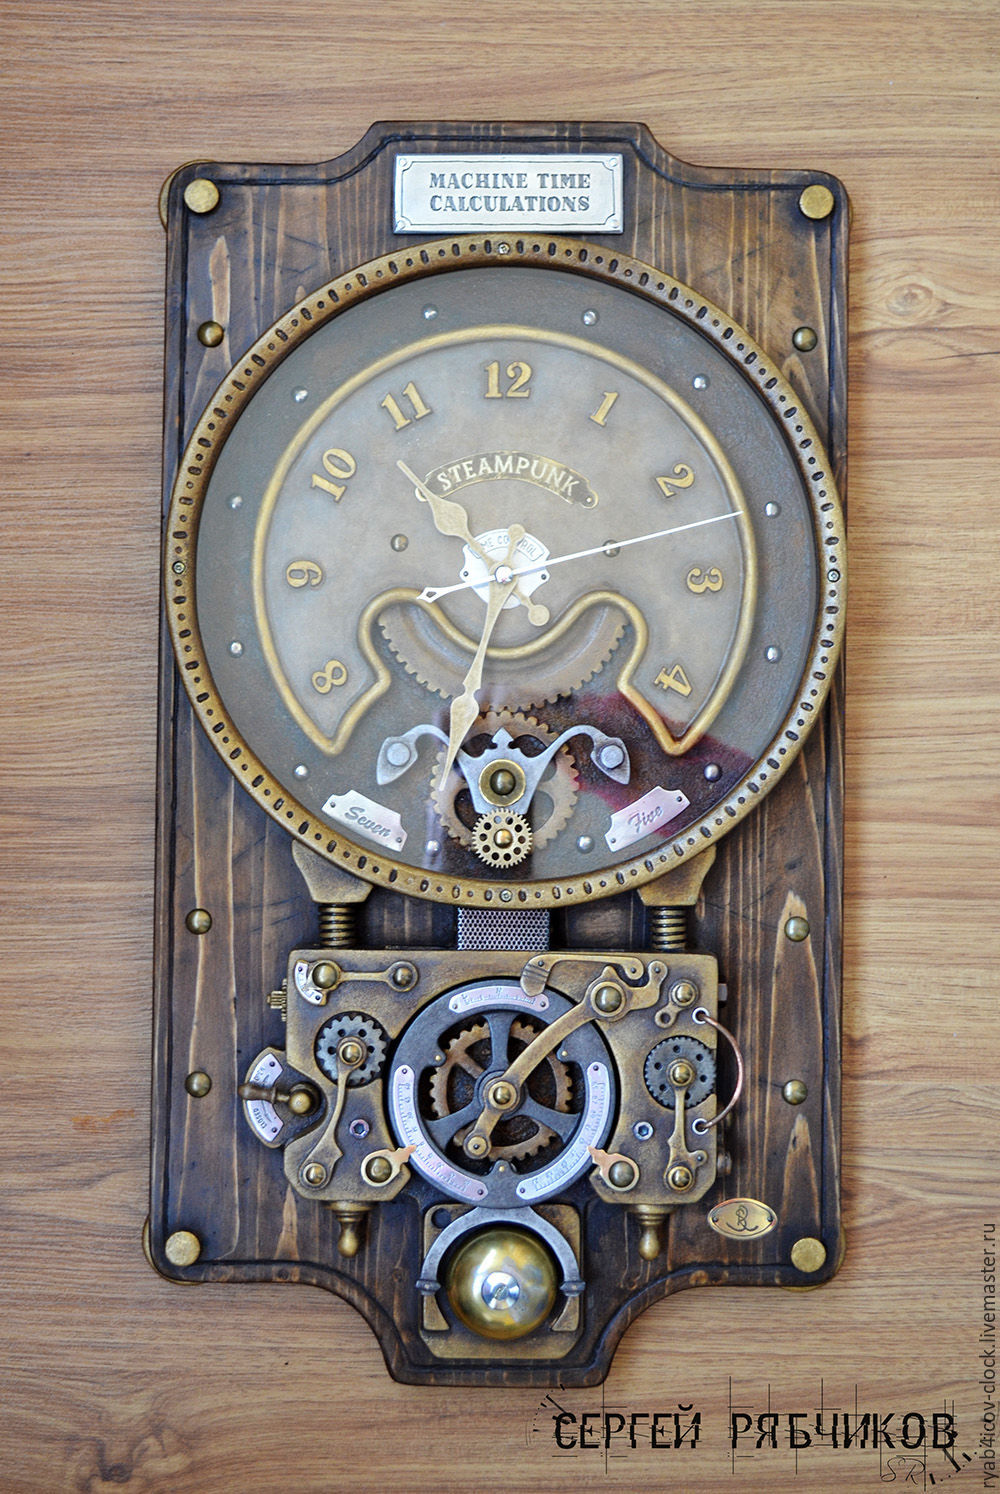 Wall clock decorative machine time calculations shop online clocks for home handmade livemaster handmade buy wall clock decorative amipublicfo Images